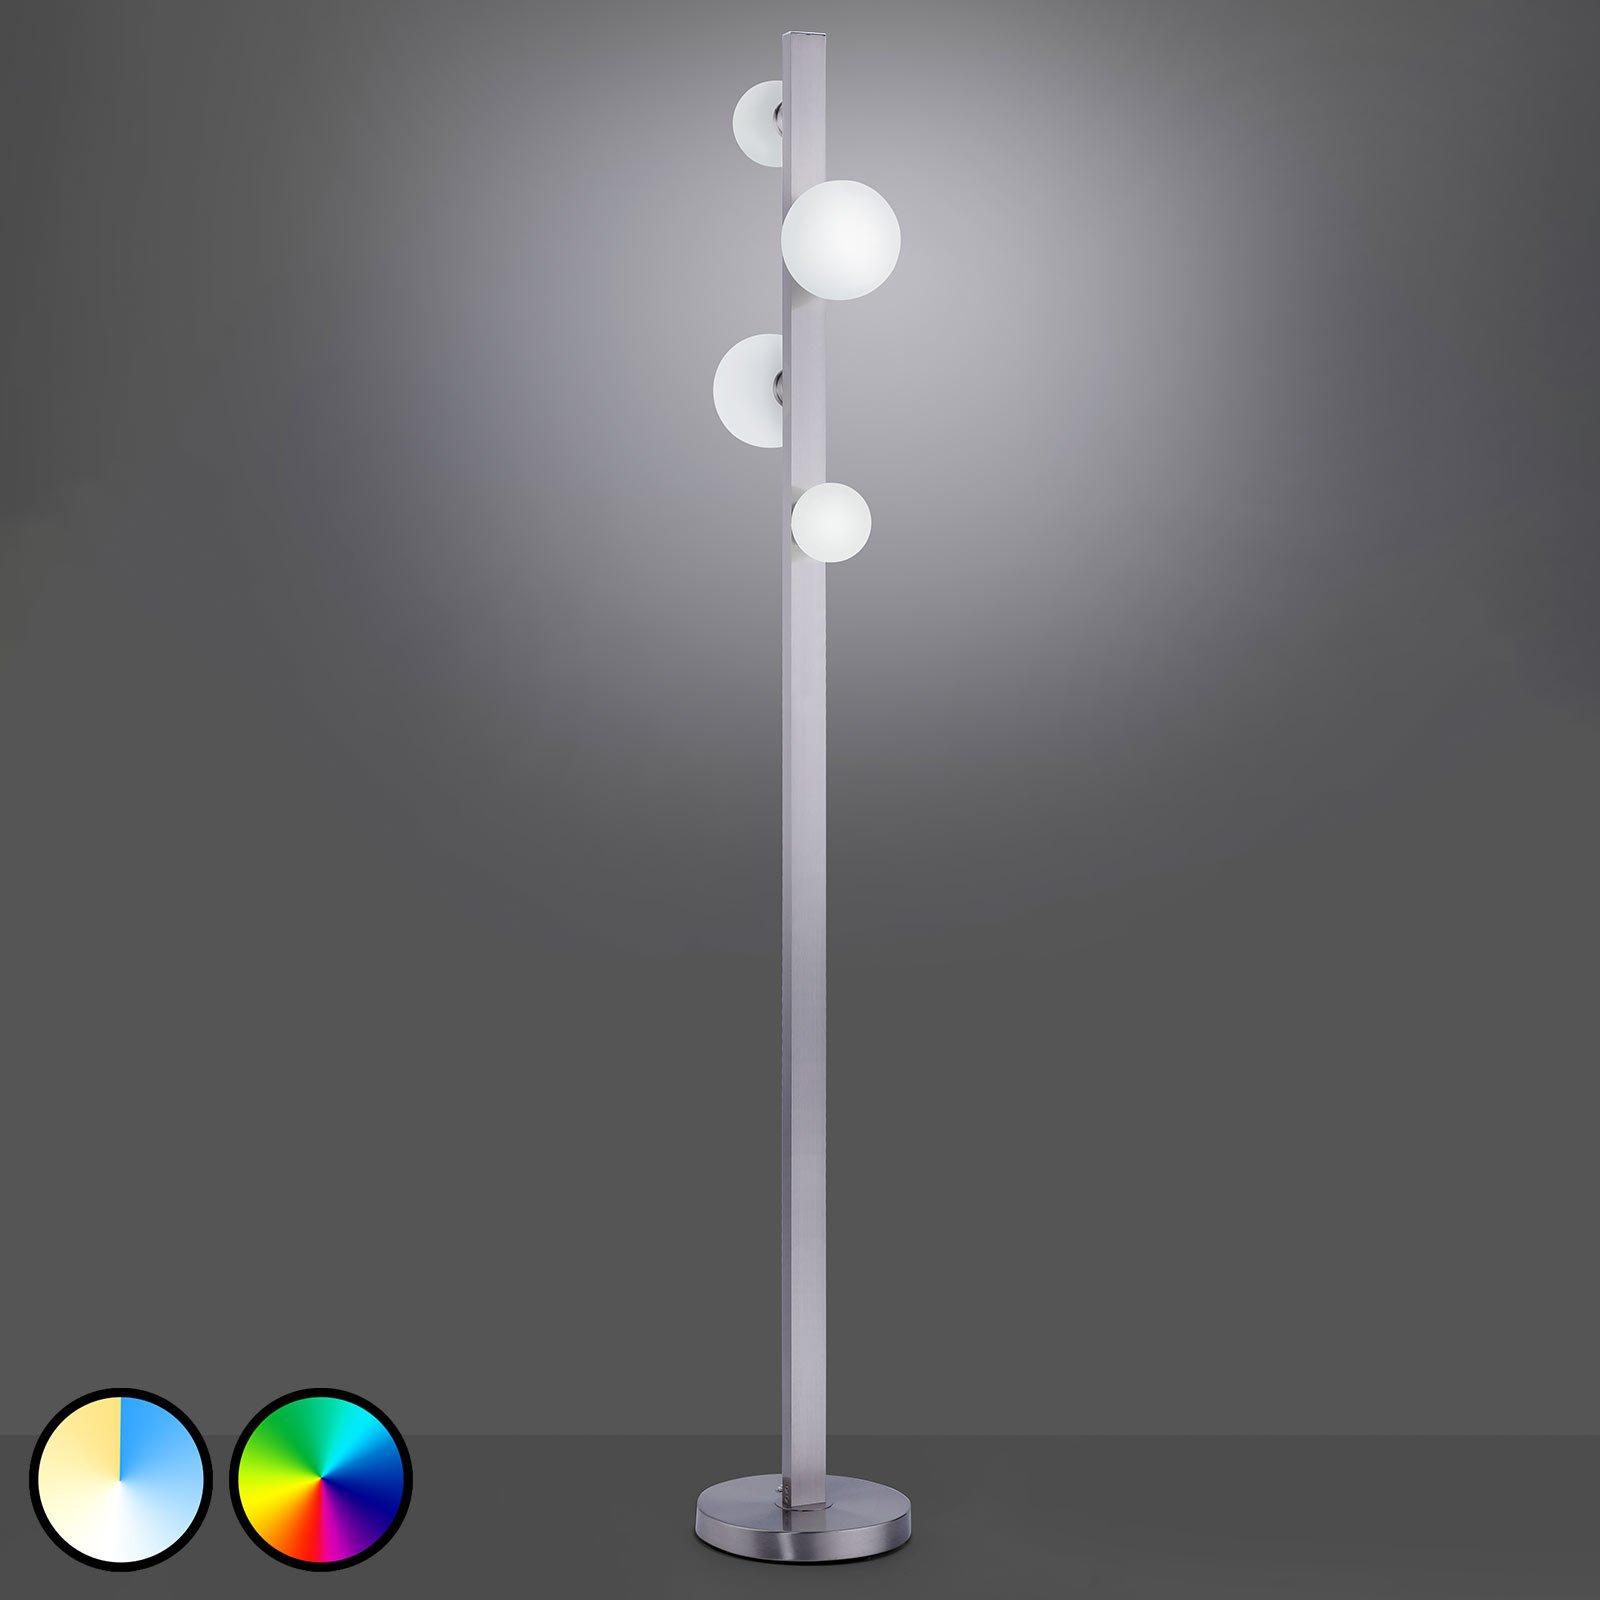 Trio WiZ Dicapio LED-gulvlampe, 4 lyskilder